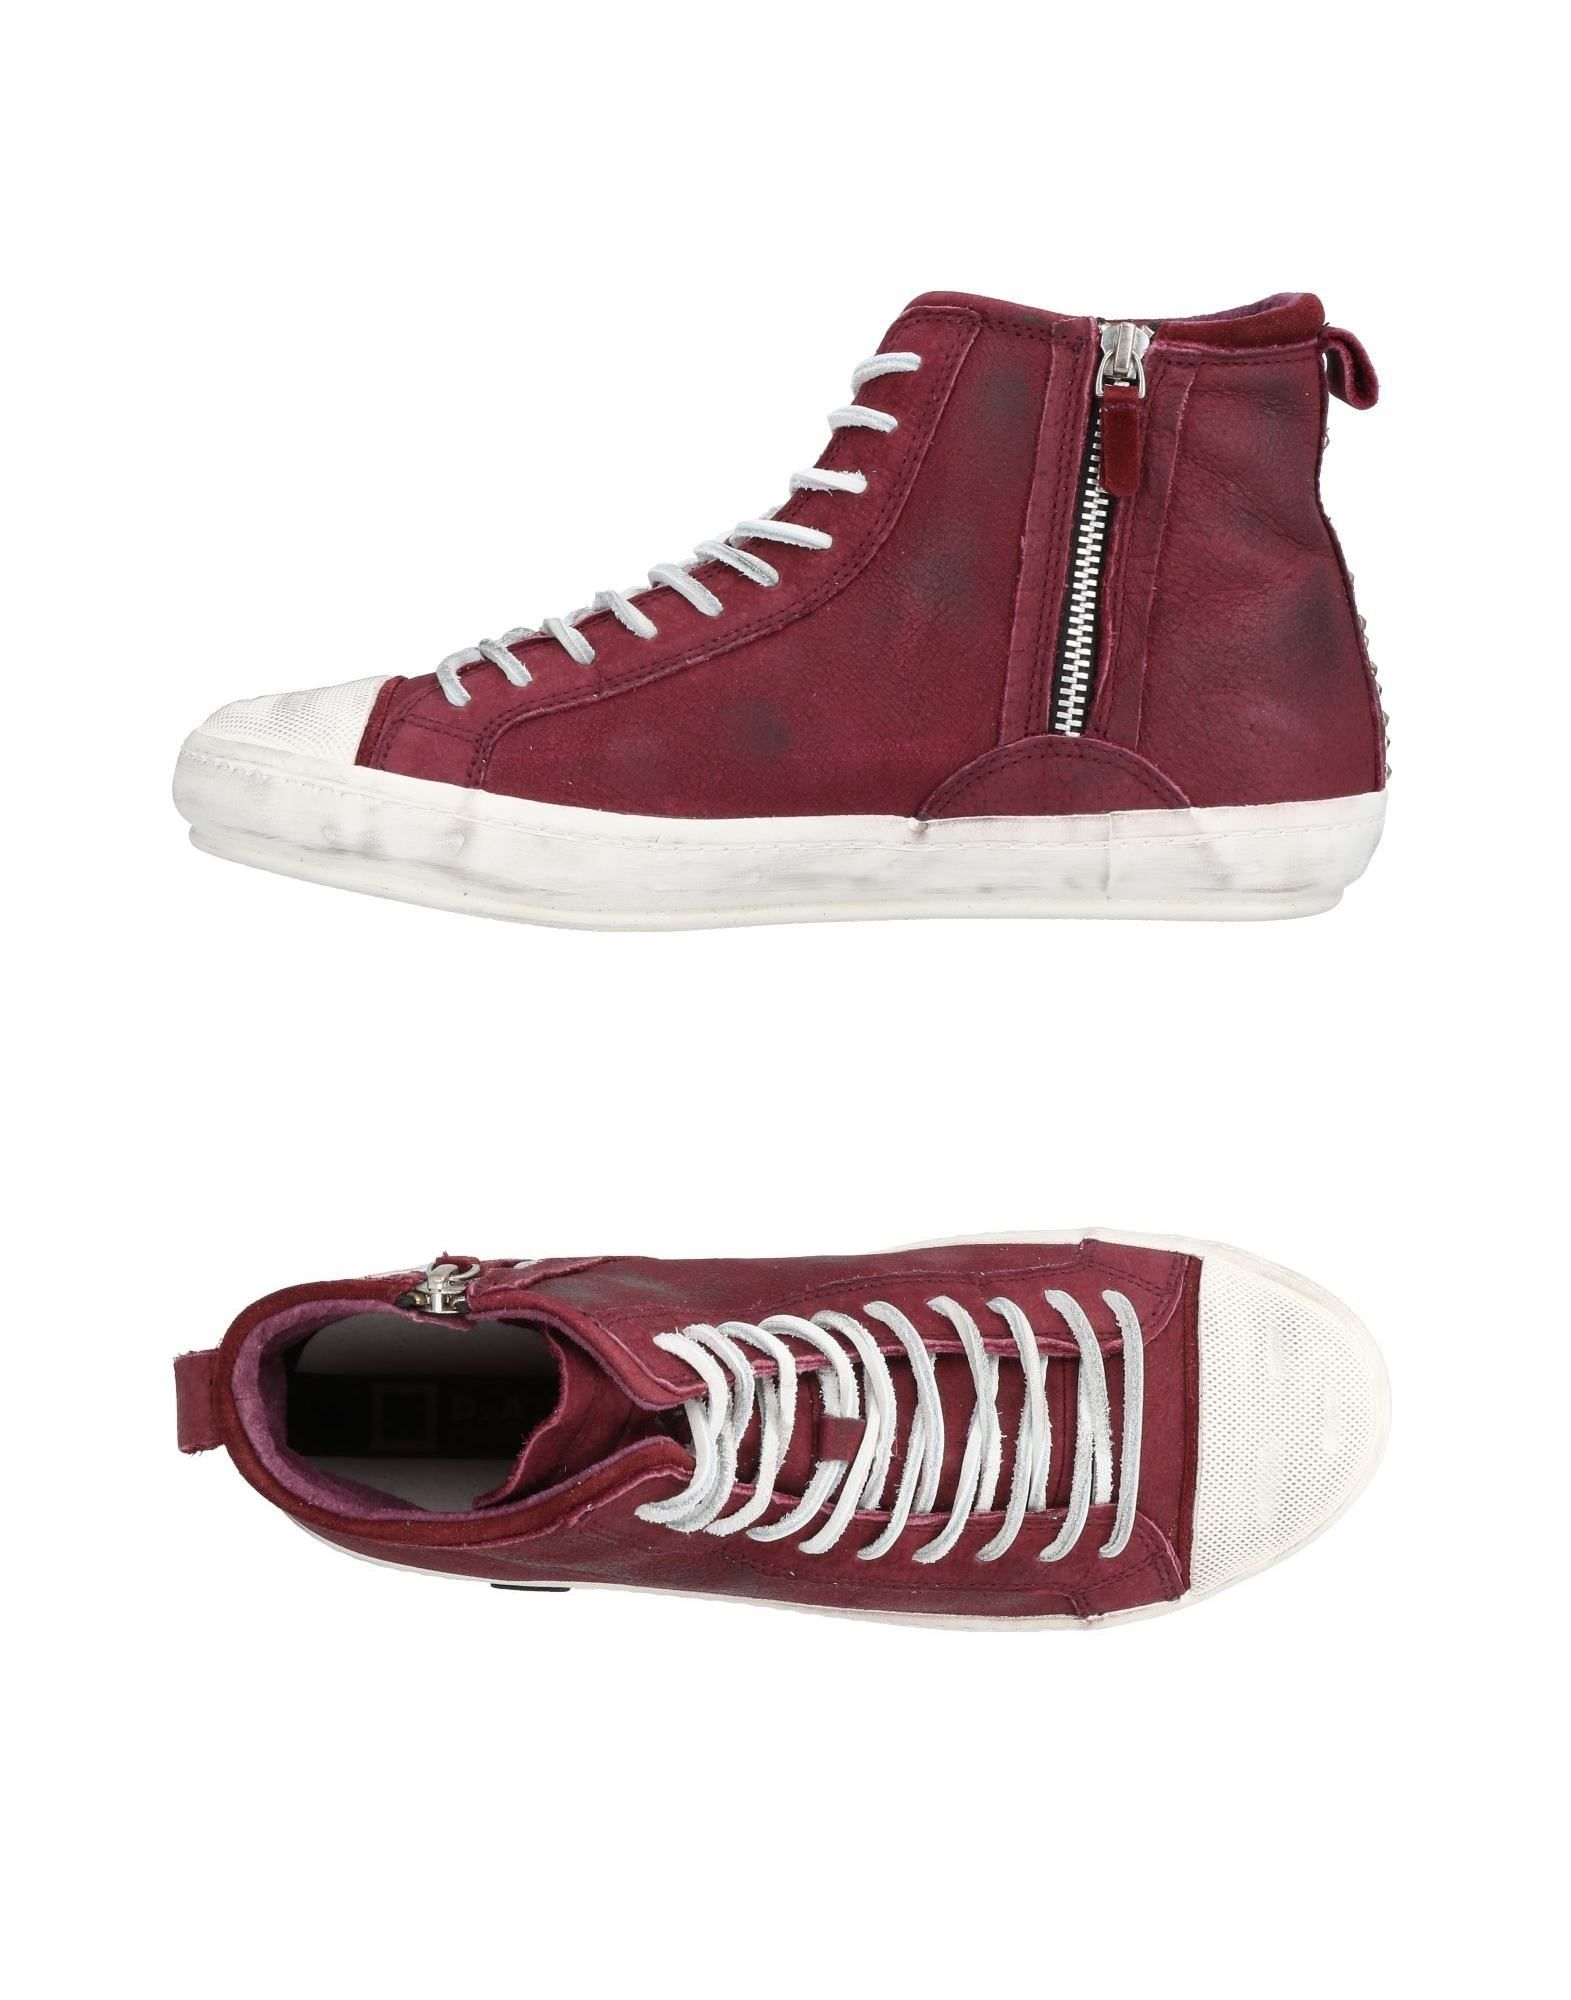 Günstige und modische Schuhe D.A.T.E. Sneakers Damen  11476259HJ